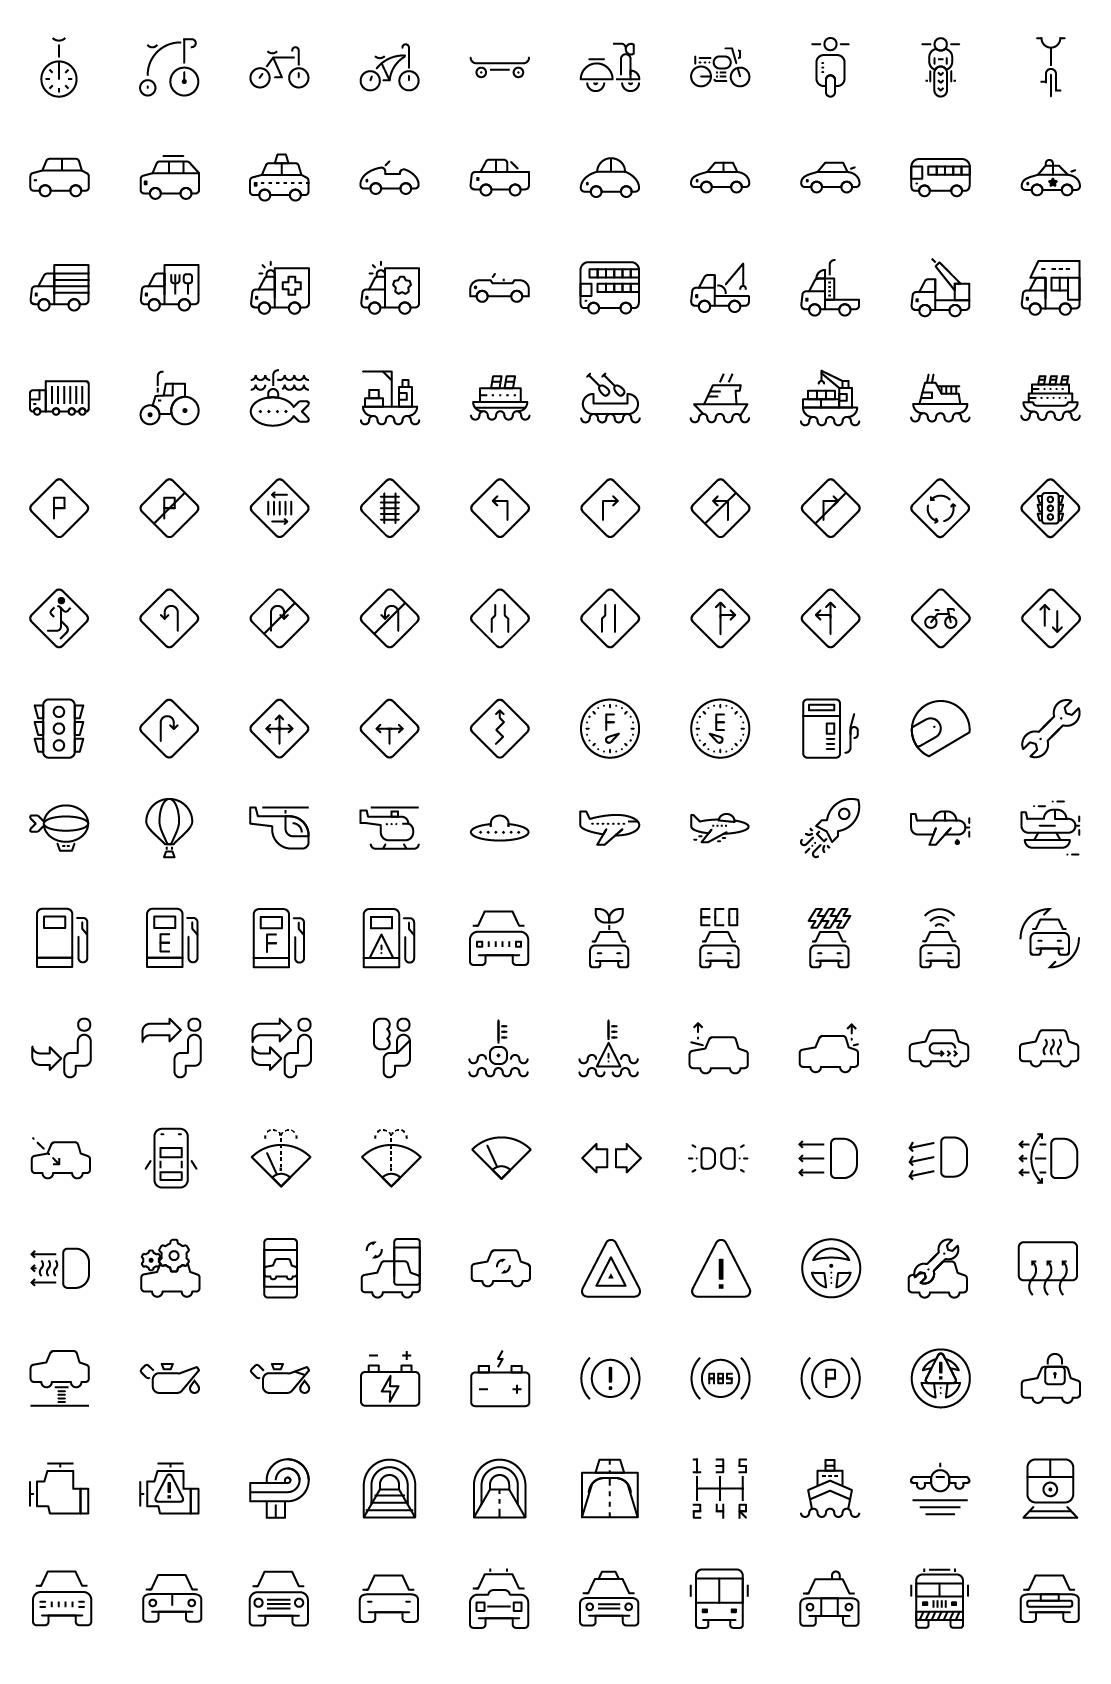 7 000 Native Line Icons Pack Round Icons Premium Doodle Art Journals Bullet Journal Doodles Doodle Icon